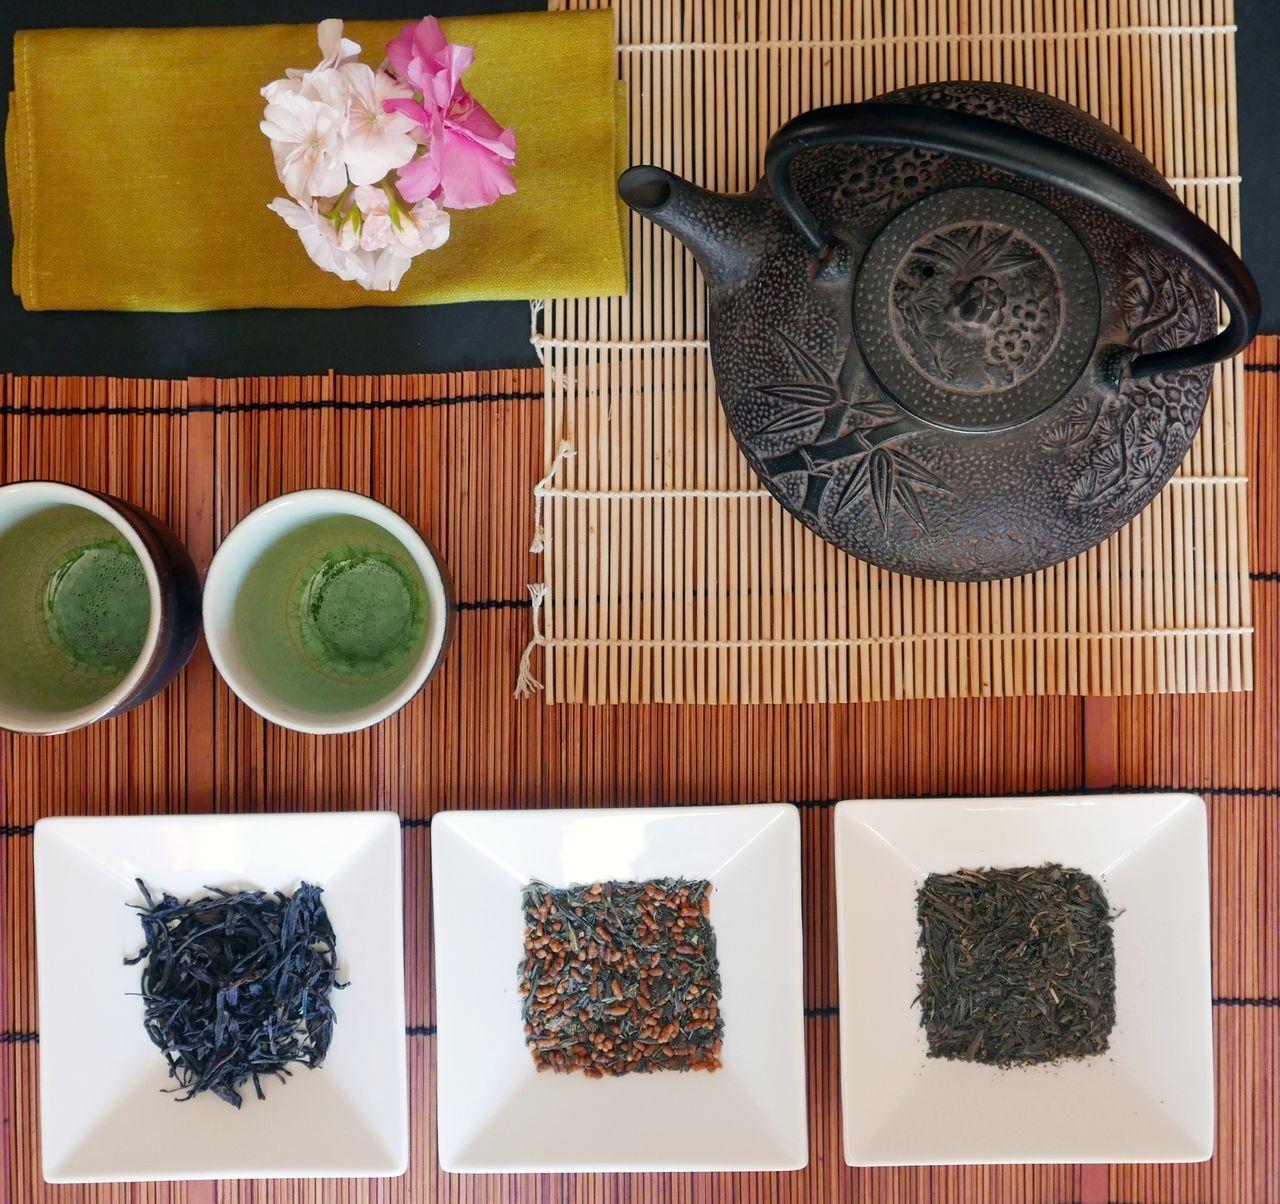 different kind of Far East tea Cast iron teapot still life Tea Ceremony Far East Still Life Teapot Tea